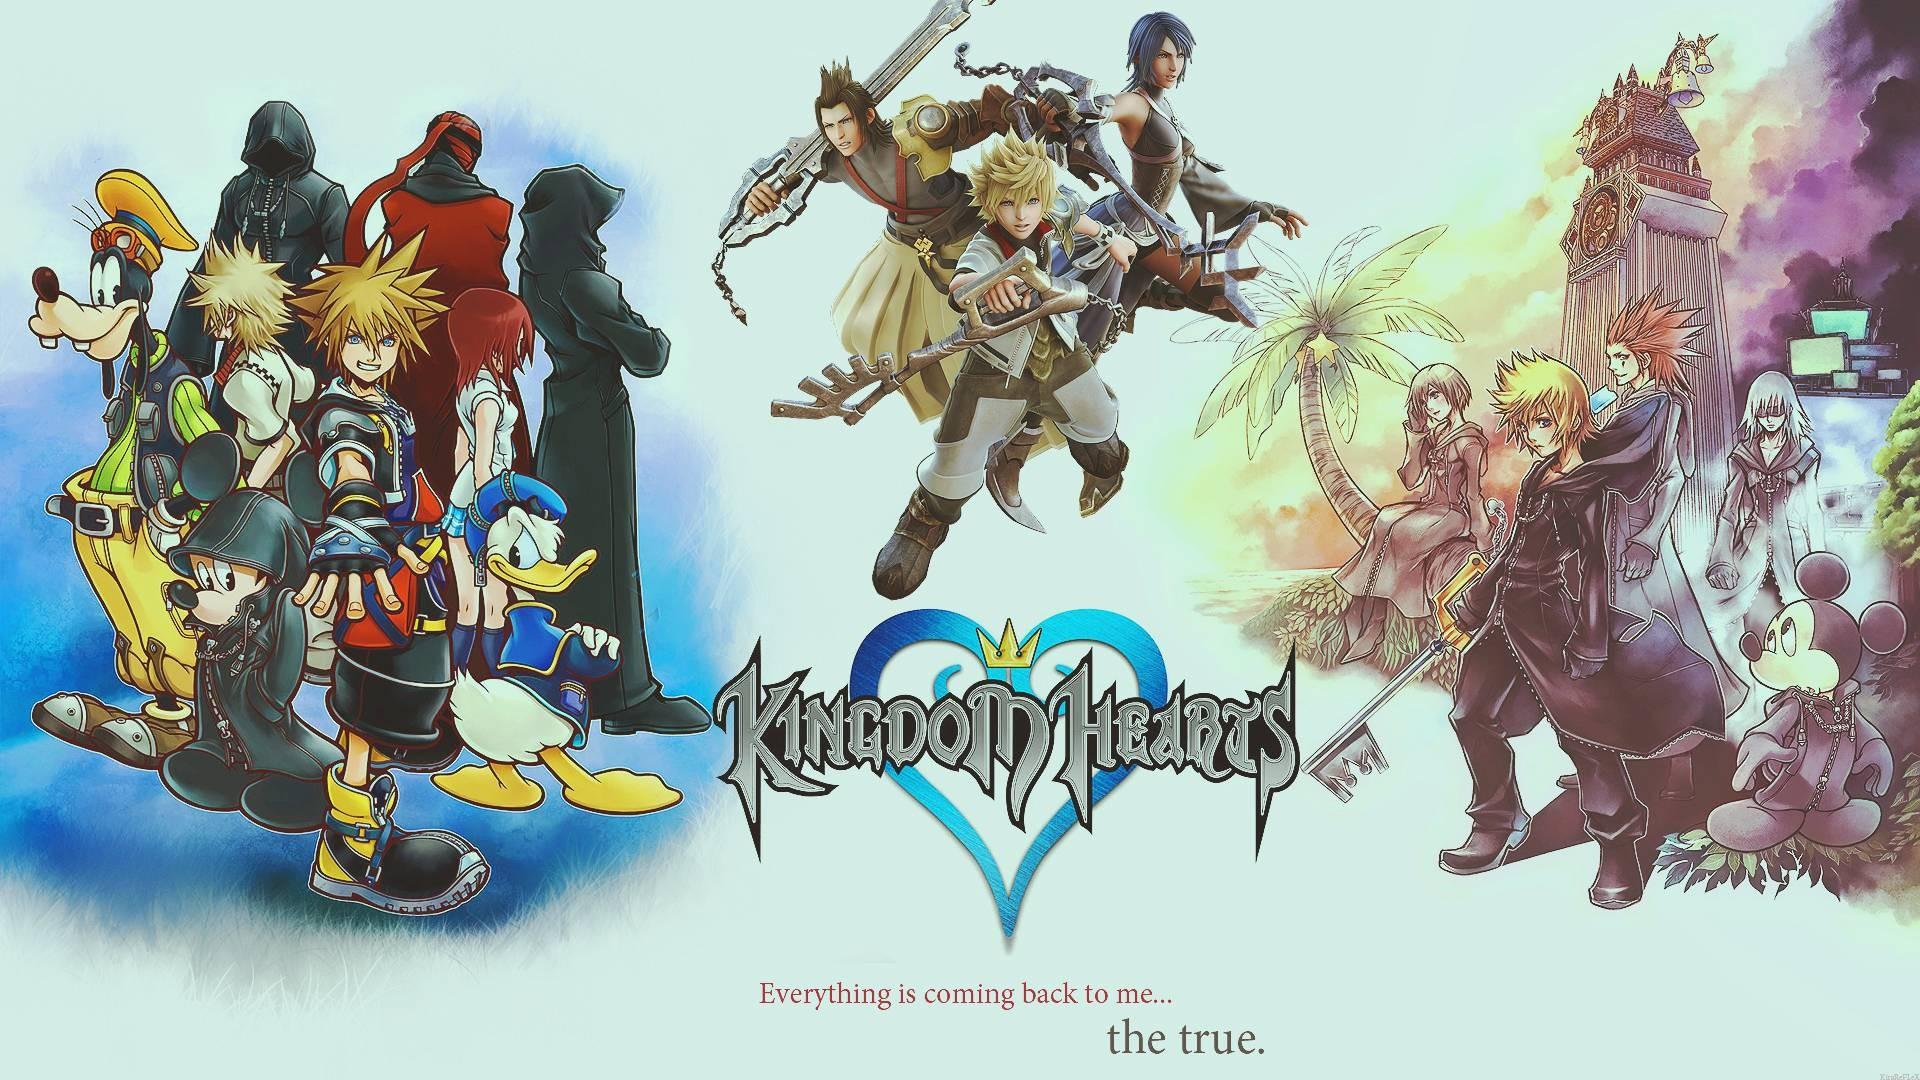 Kingdom Hearts Wallpaper 1920x1080 Download Free Amazing Hd